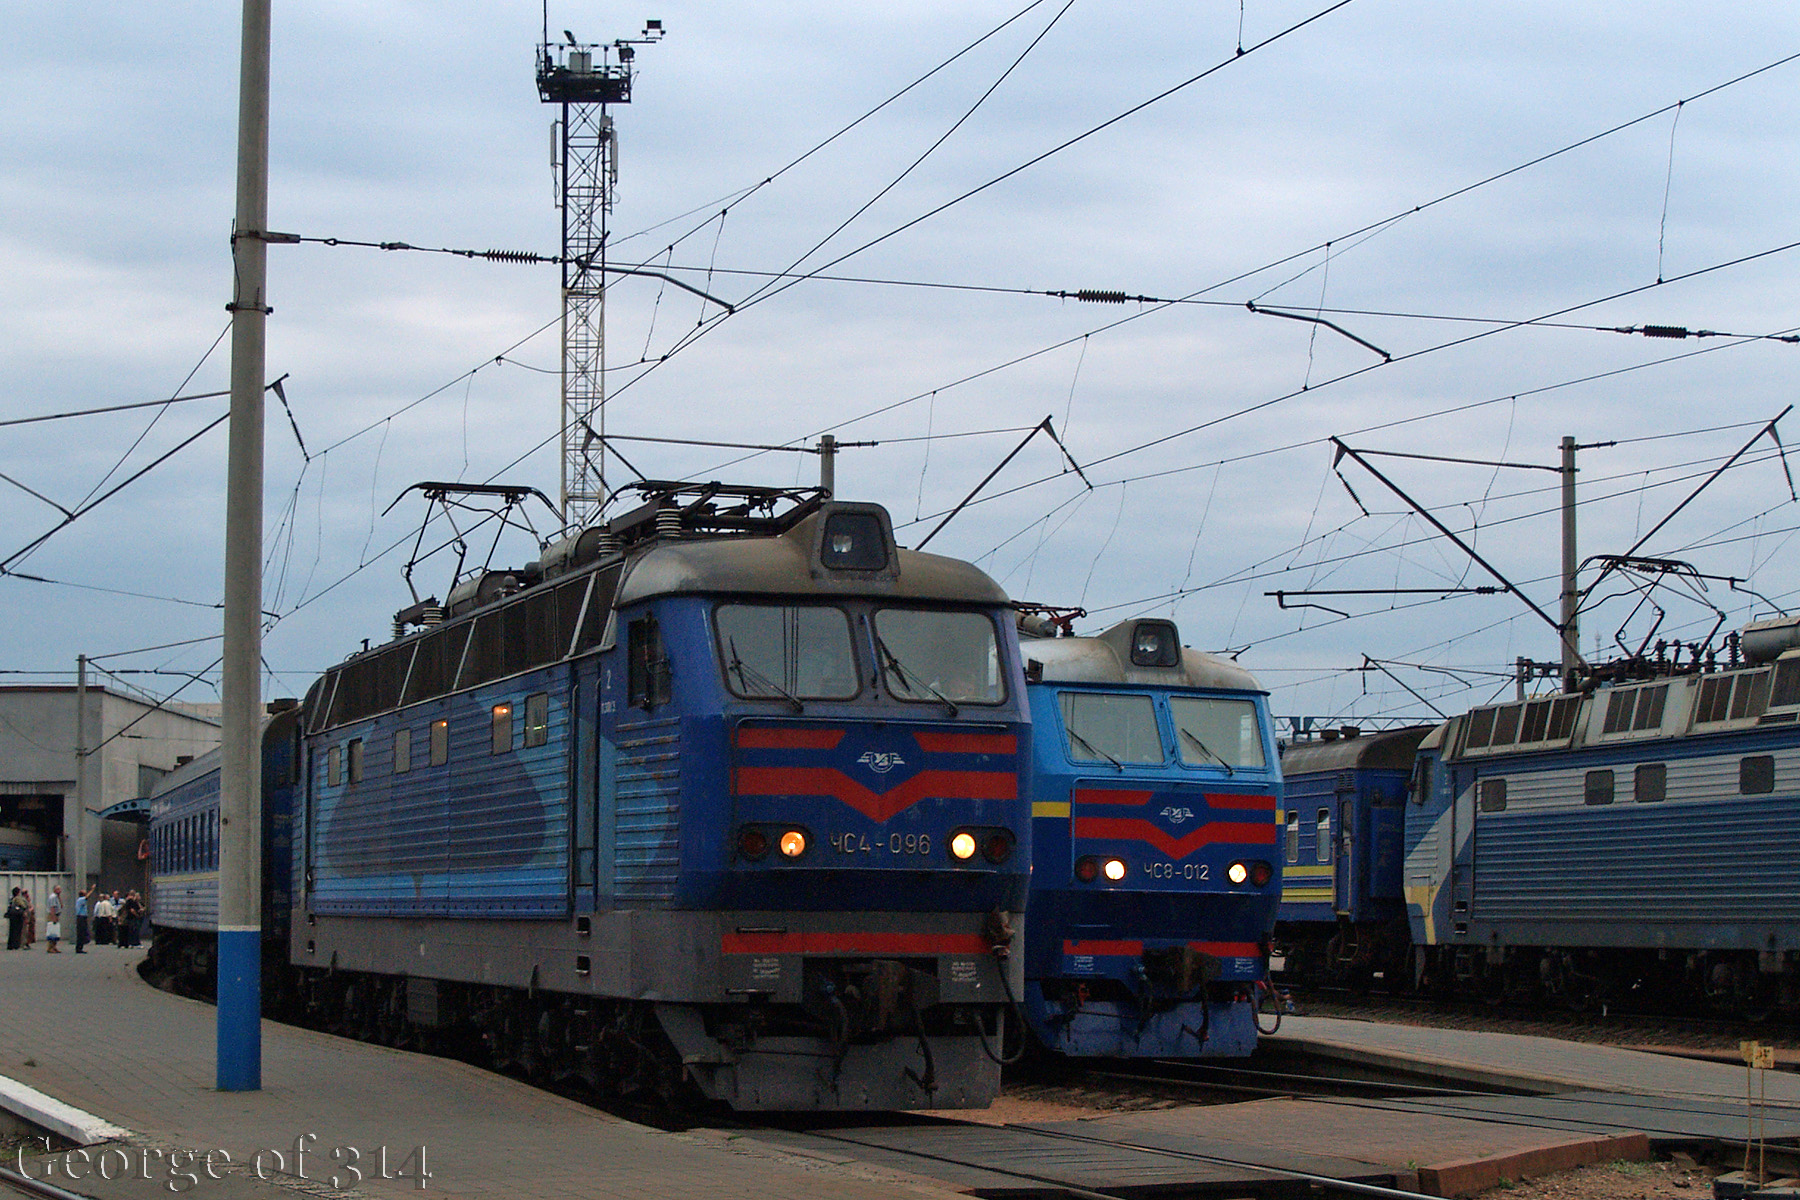 Електровози ЧС4-096, ЧС8-012, ст. Київ-Пасажирський